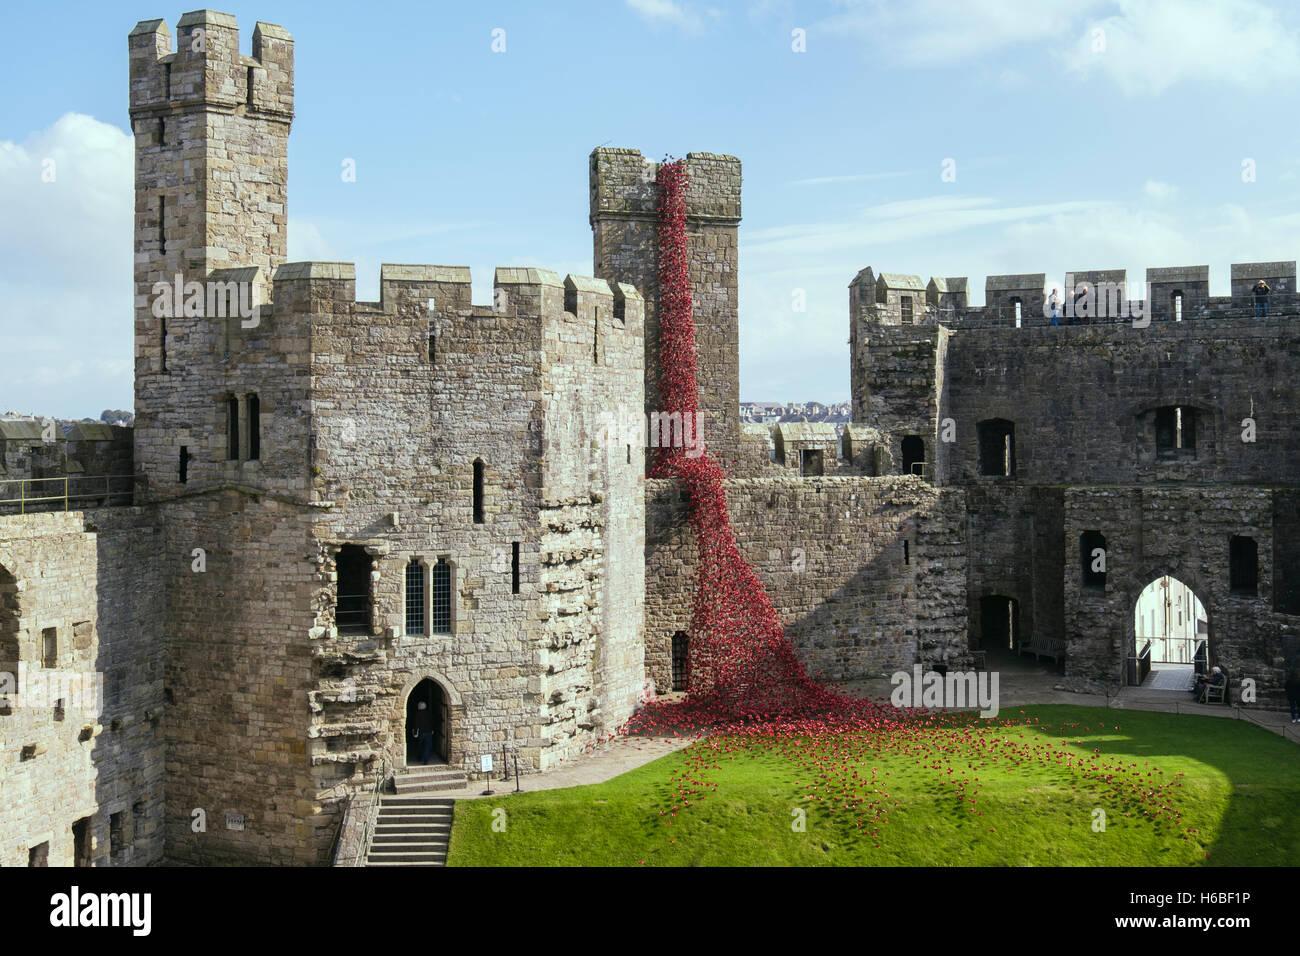 Weeping Window art sculpture of ceramic red poppies display in Caernarfon castle walls. Caernarfon Gwynedd North - Stock Image